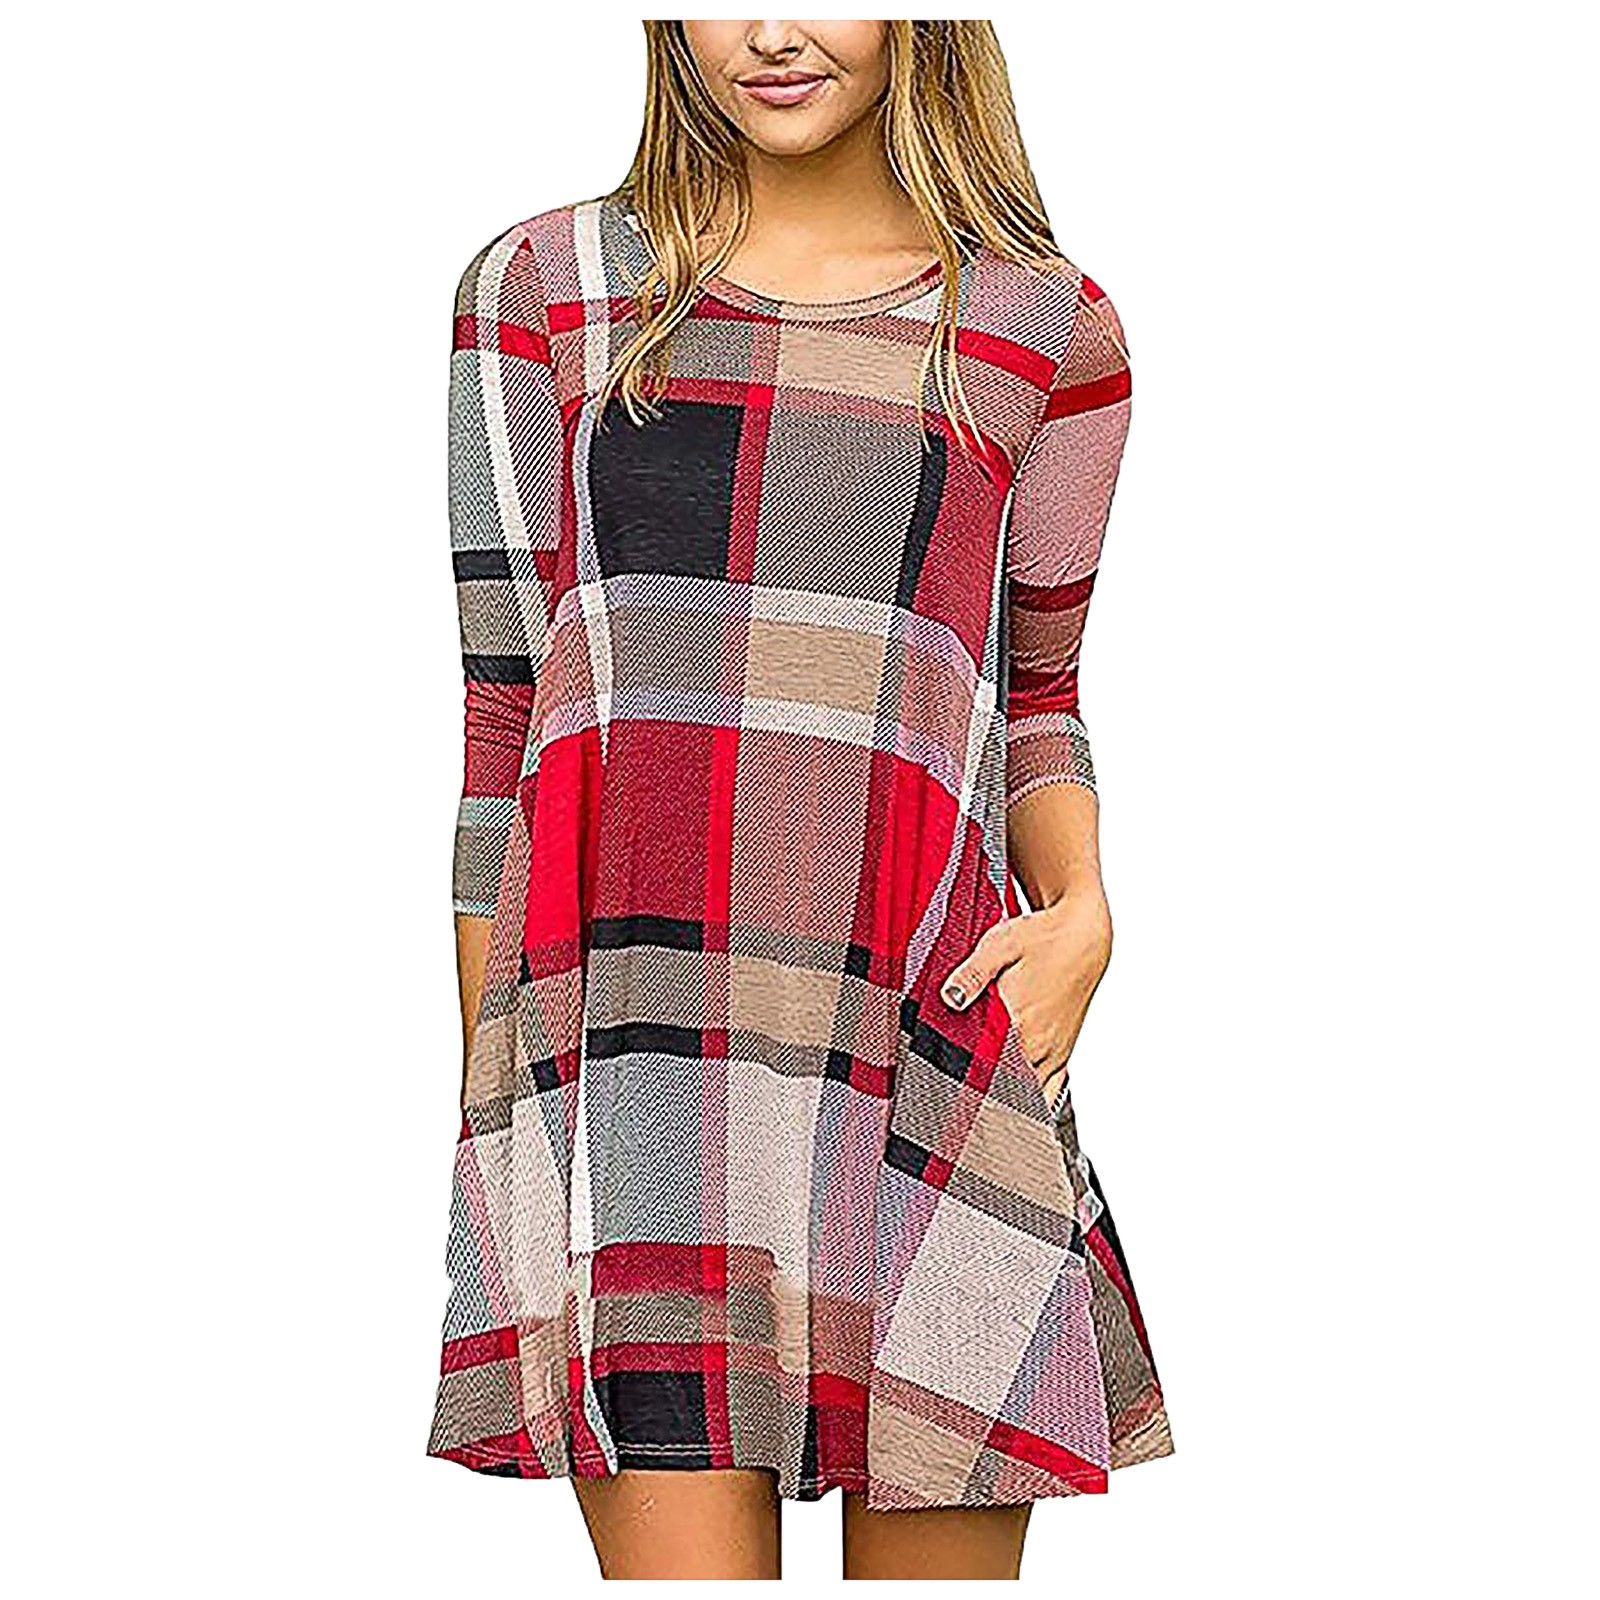 4# Women's Casual  Loose Fit Tunic Dress Long Sleeve O Neck Plaid Color Block vestido de mujer платья Women's dress robe femme